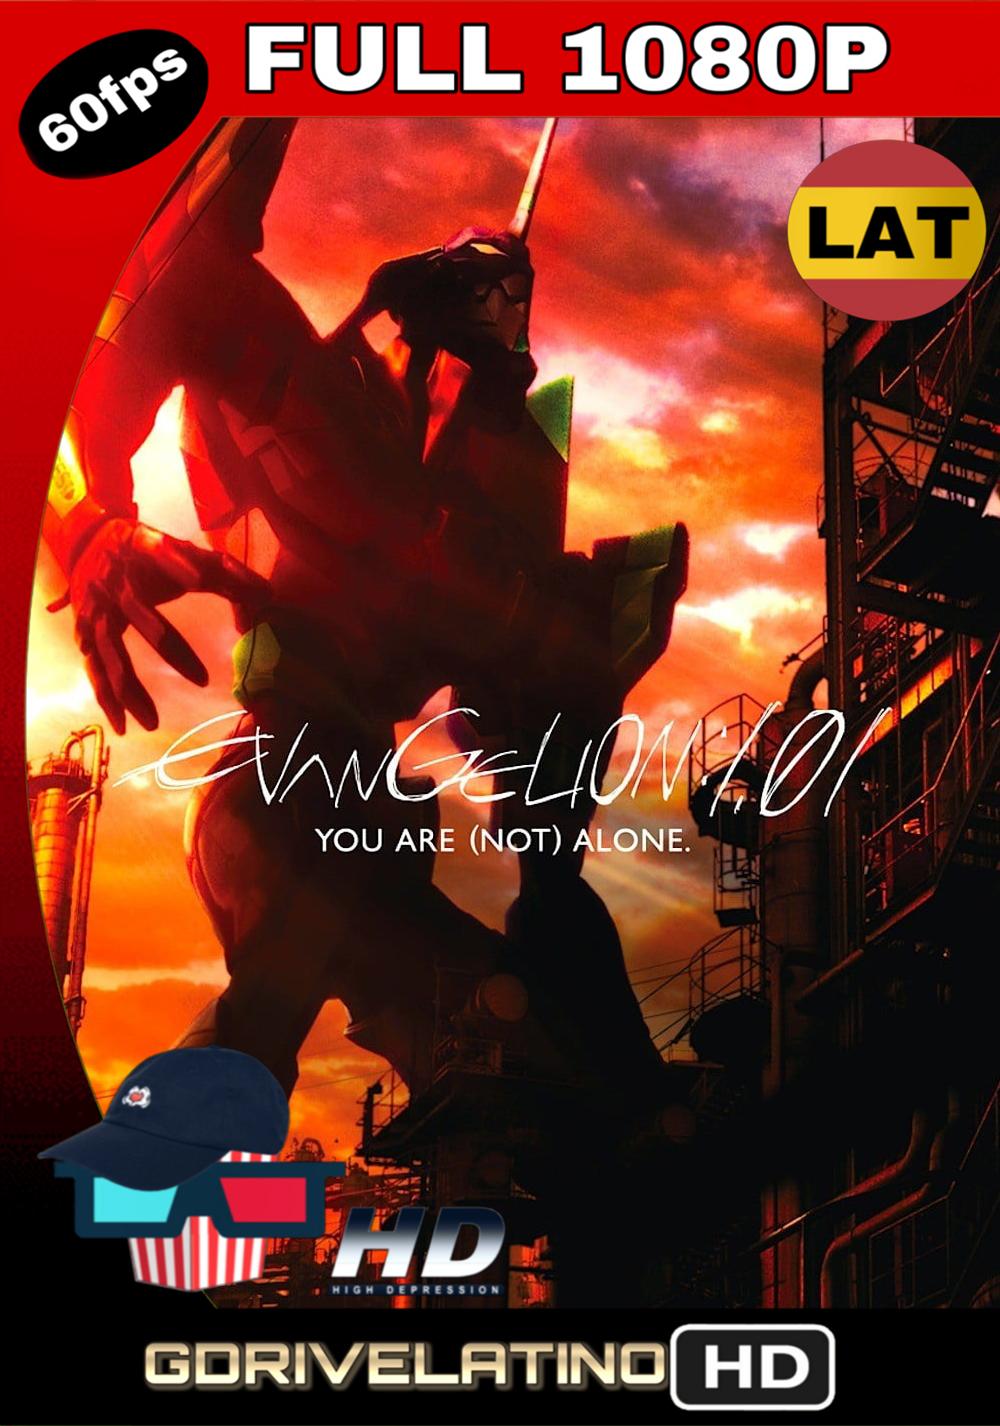 Evangelion: 1.11 Tu (No) Estás Solo (2007) BDRip FULL 1080p (Latino – Japonés) MKV